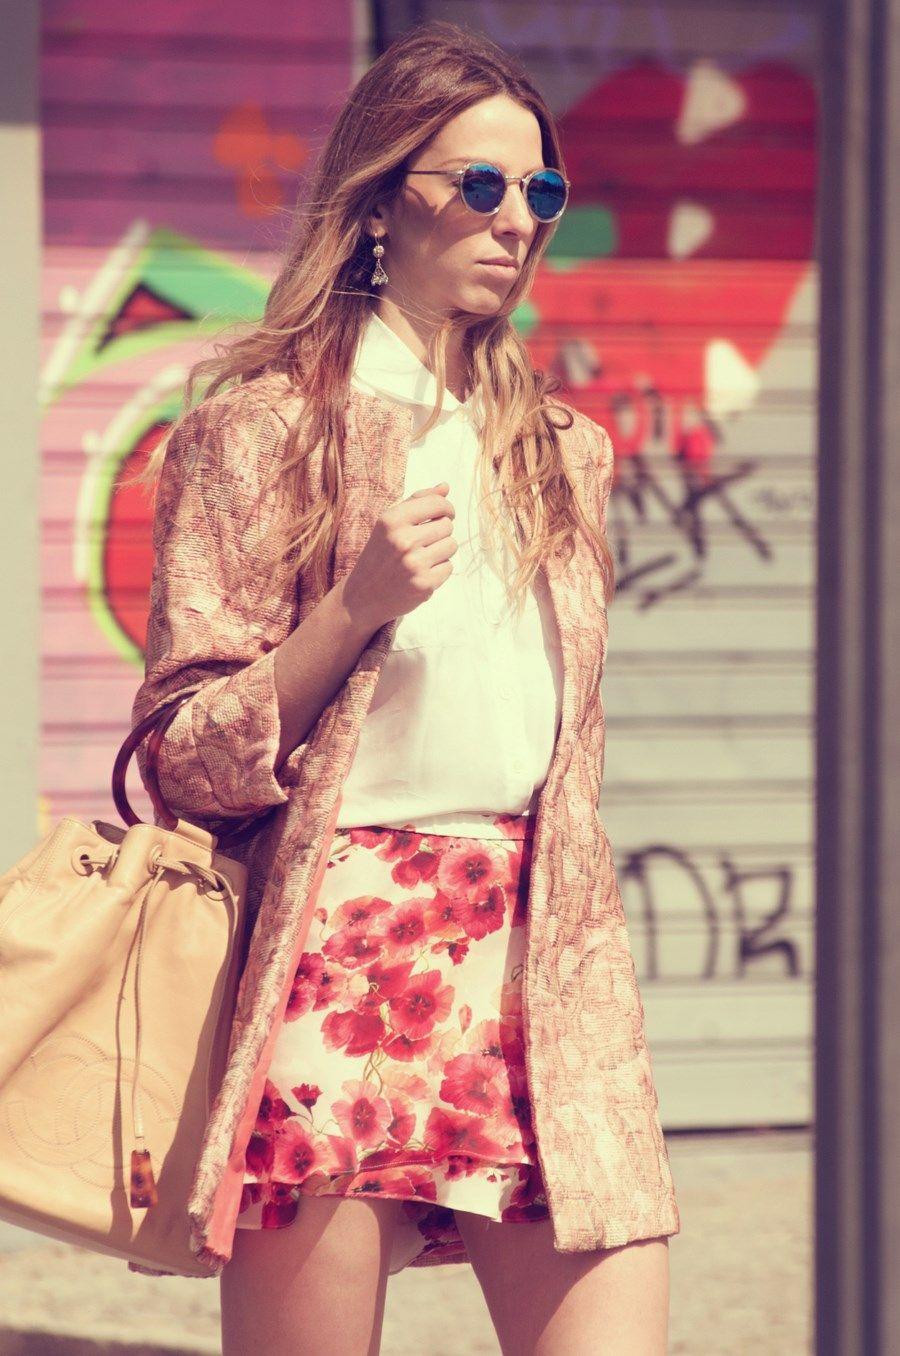 #streetstyle #hippie #flower #chanel #hautehippie #fashion #style #fashionblogger #muserebelle #ms #athens